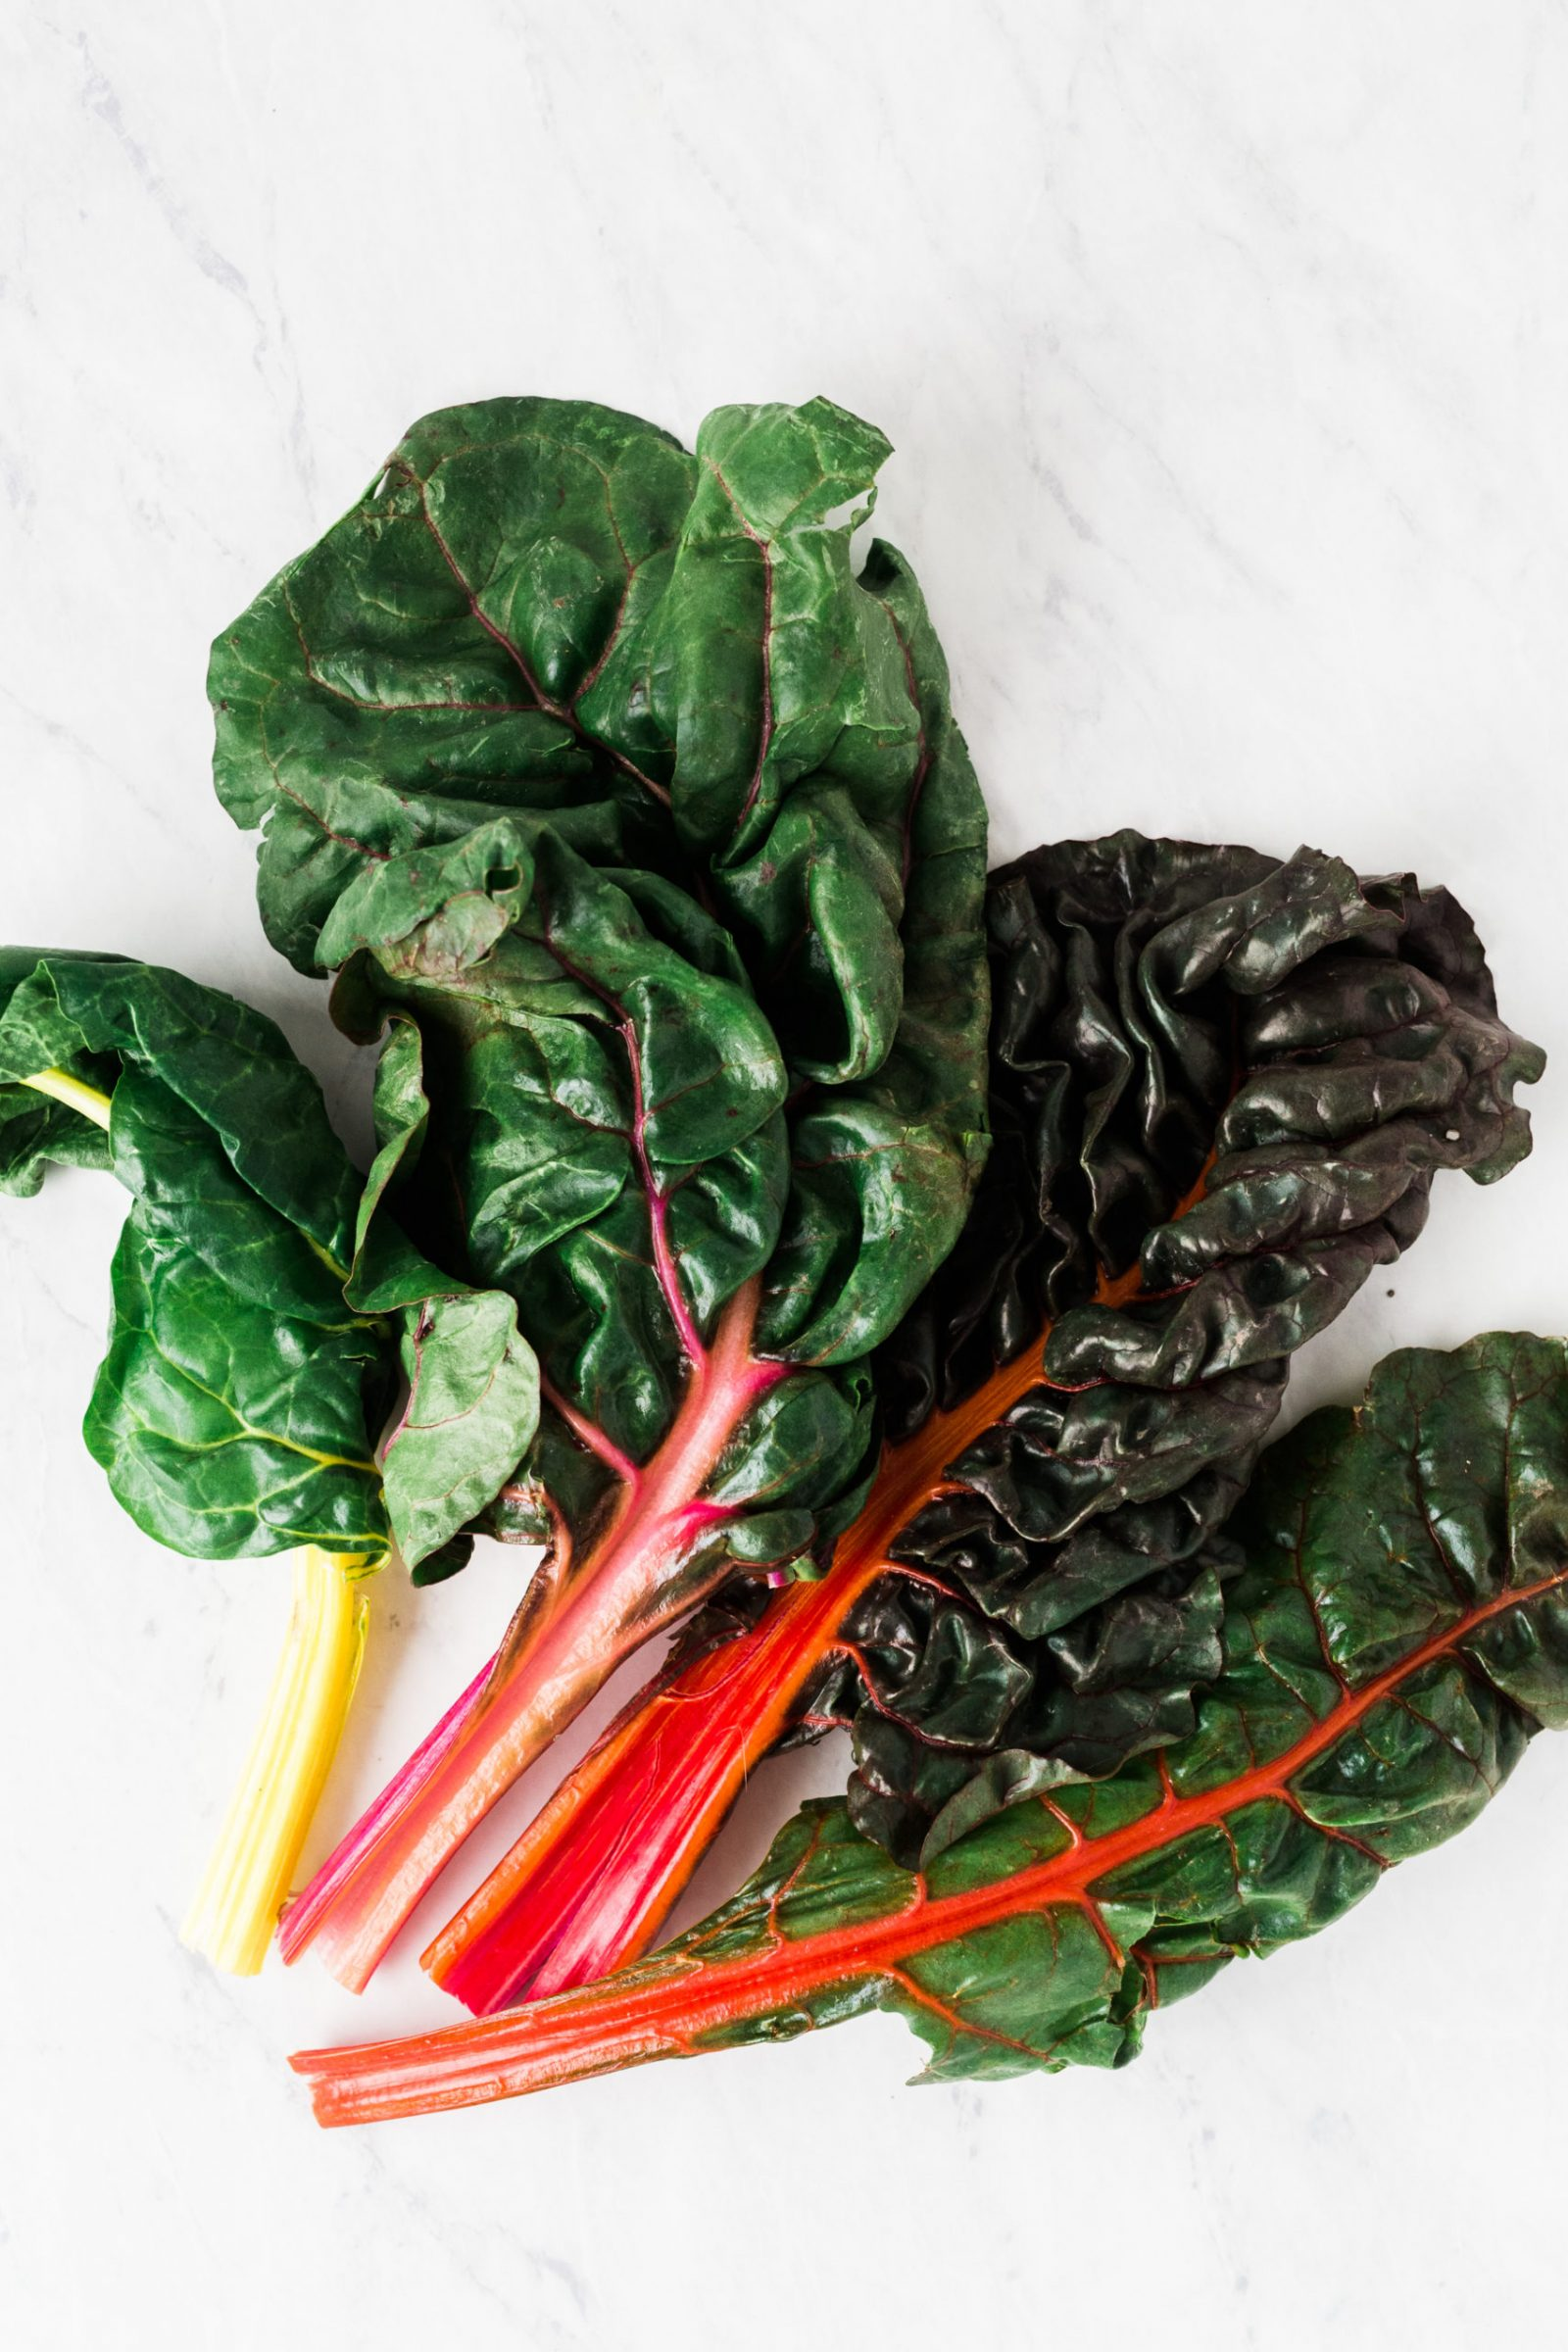 kale as a nutrition source